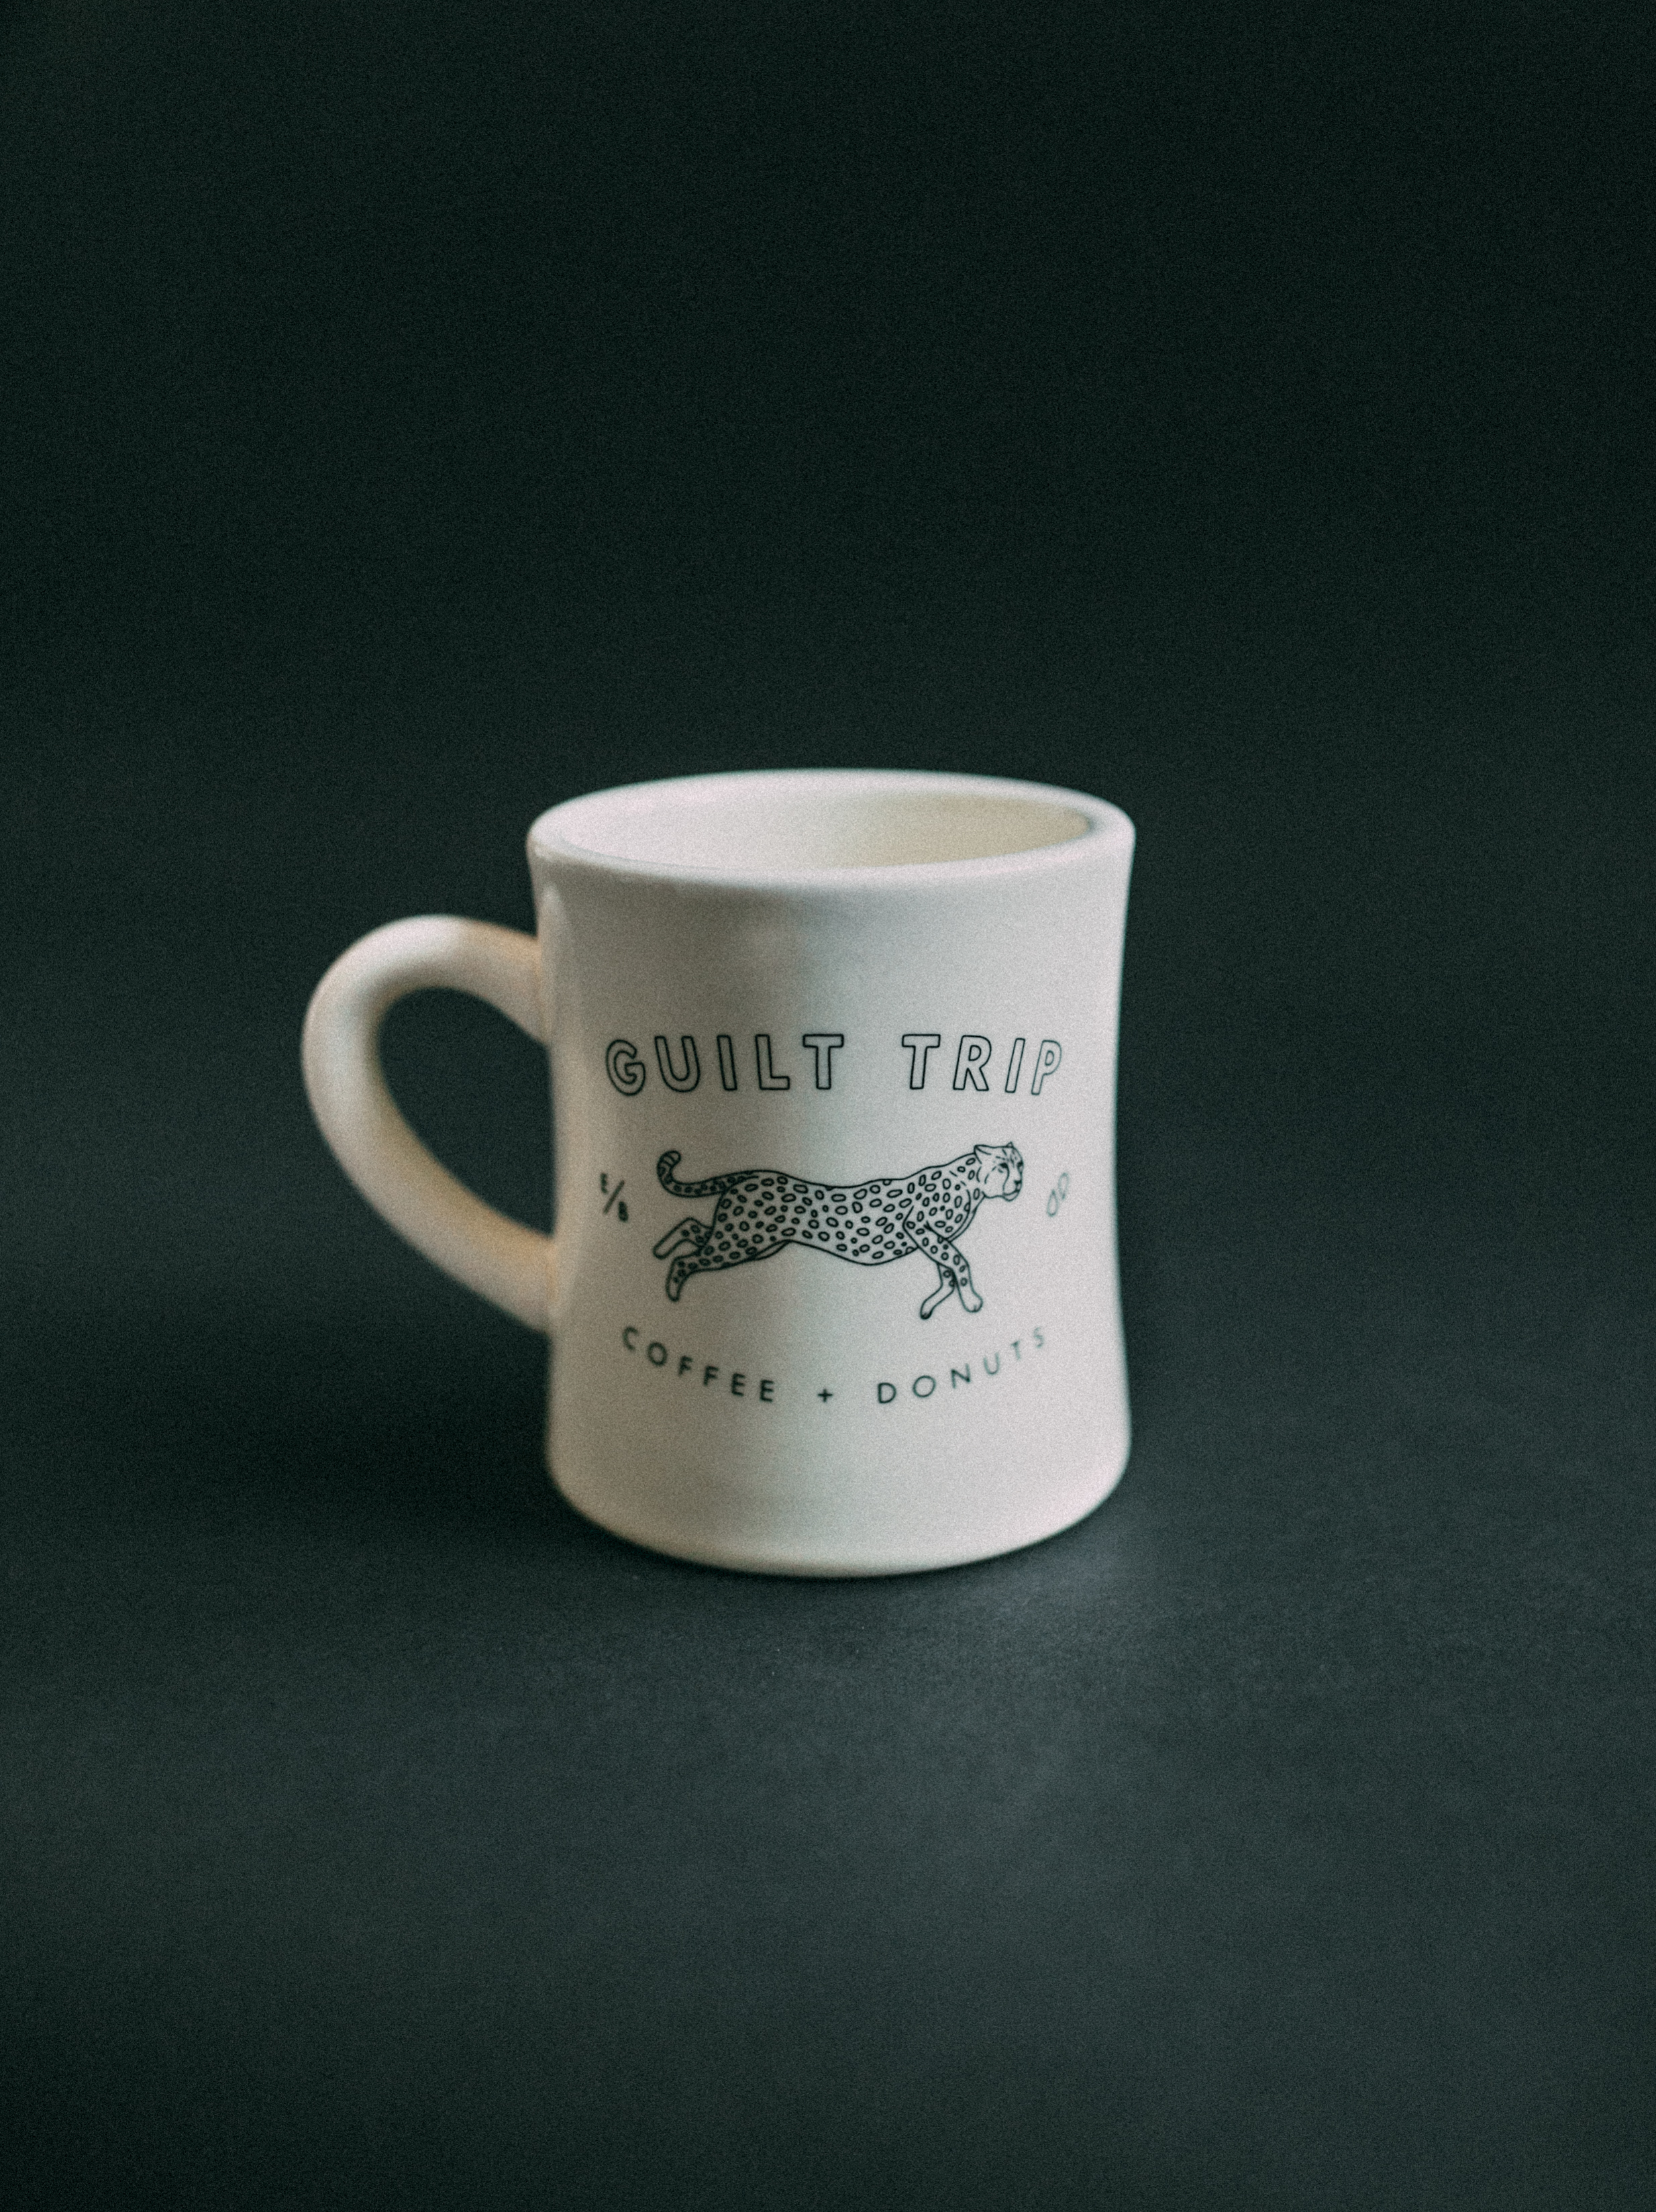 Diner Mug 02 Guilt Trip Coffee Donuts